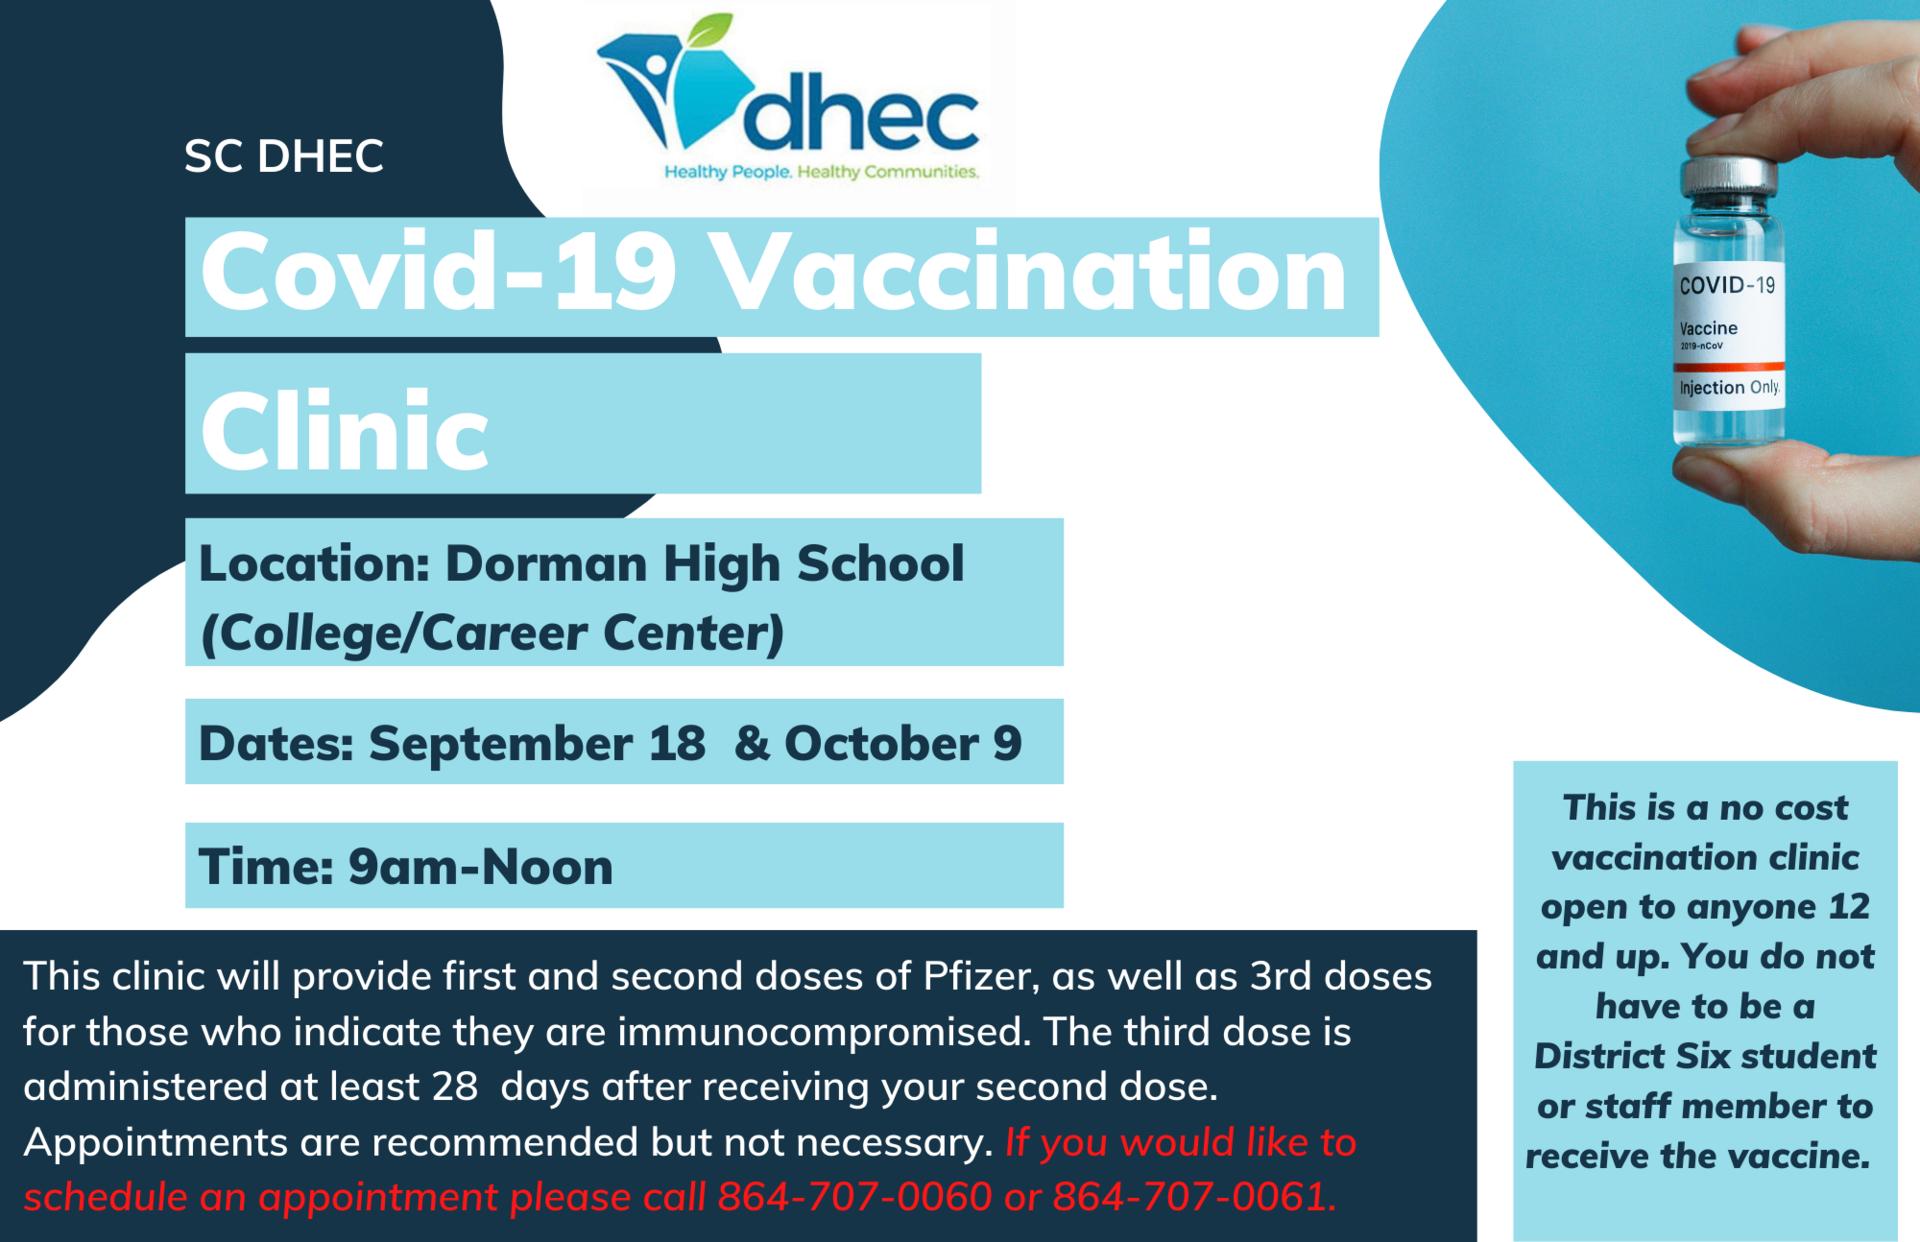 Vaccine Clinic info